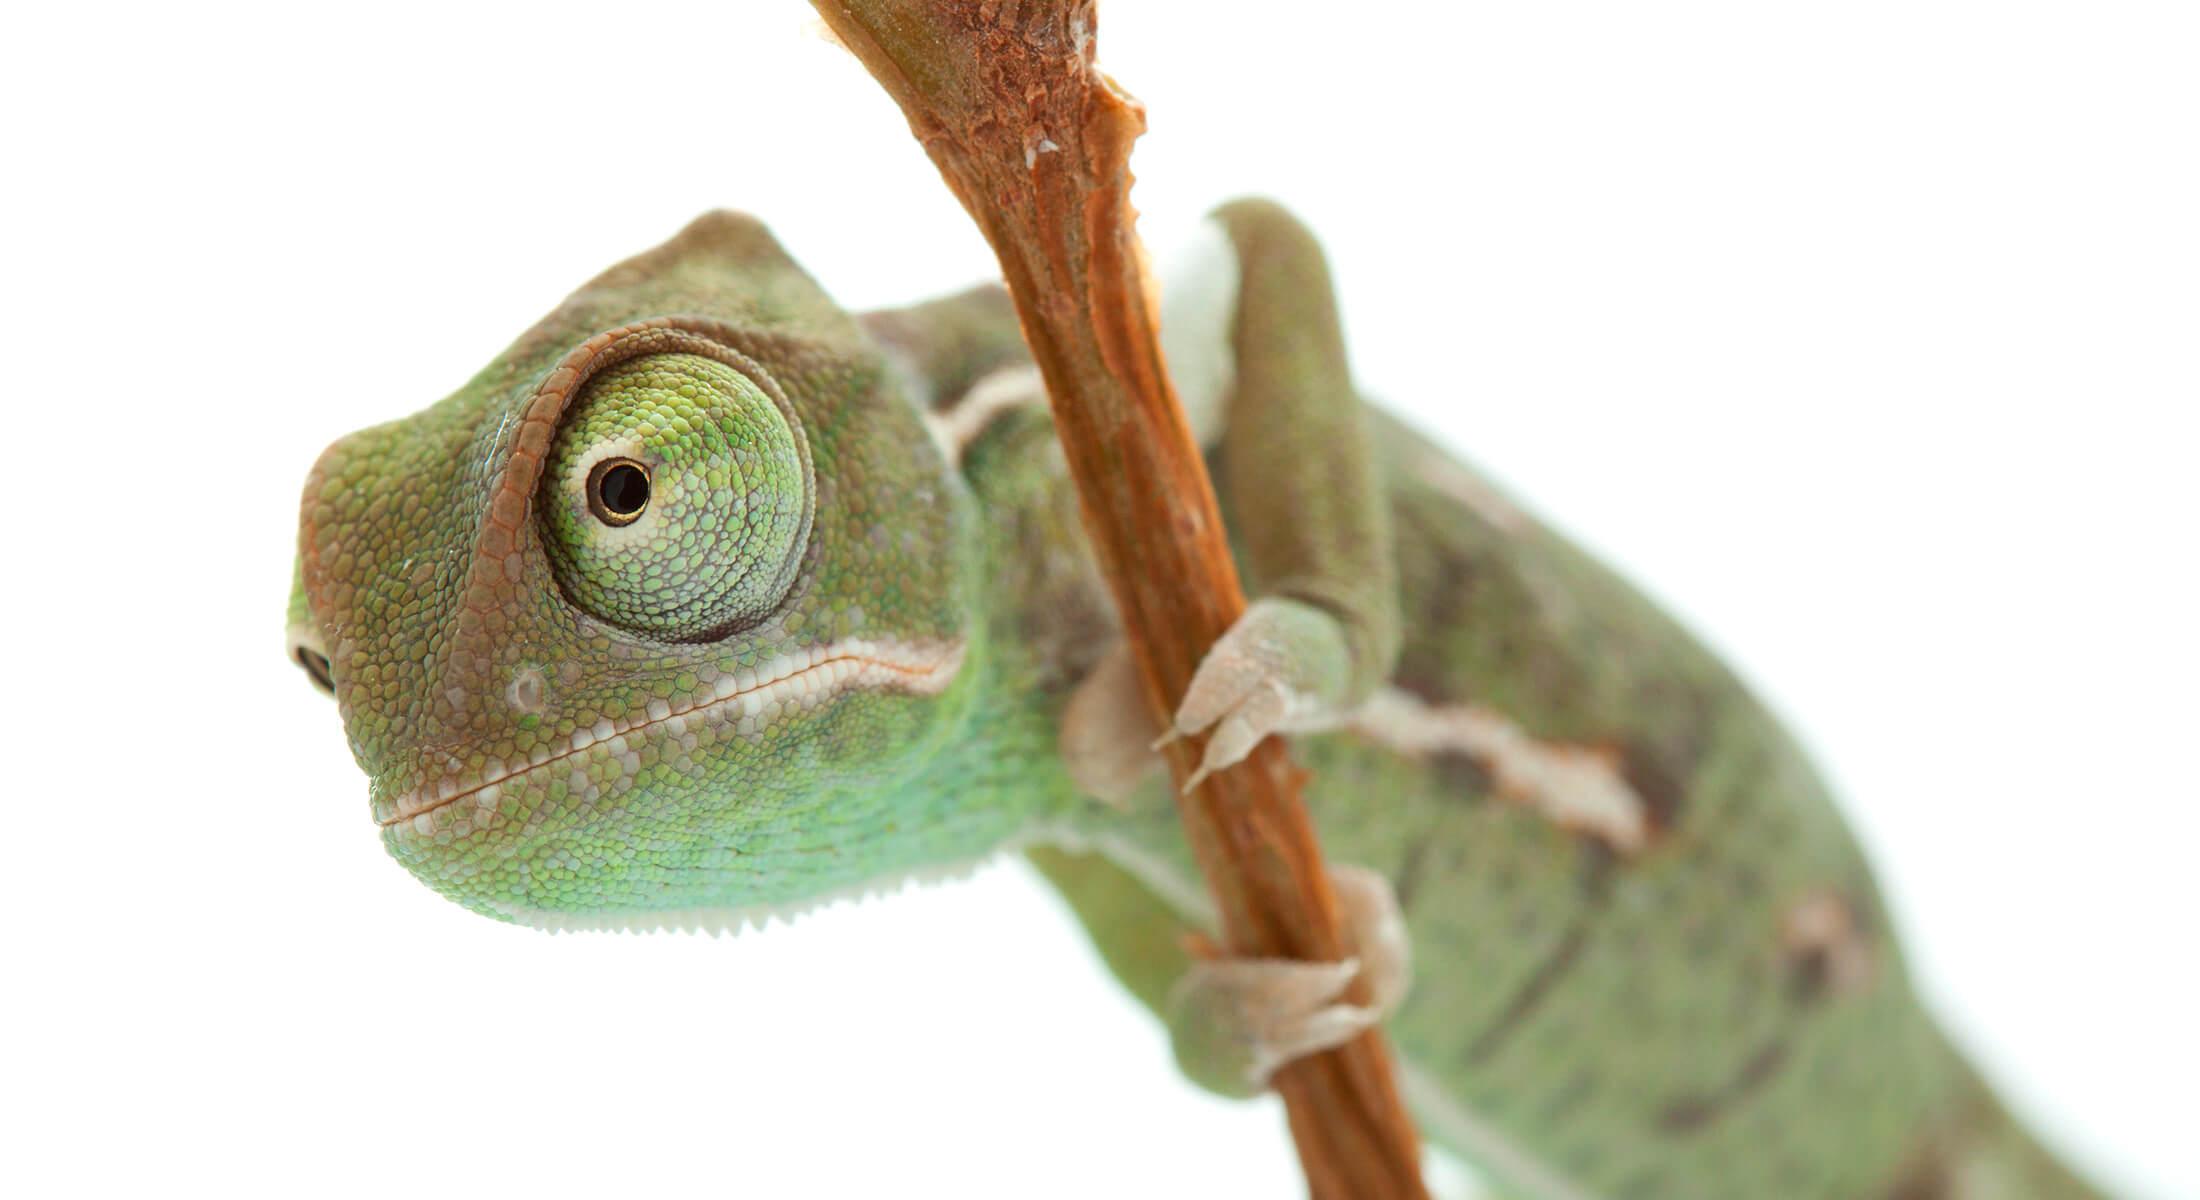 Macro of chameleon with narrow focus